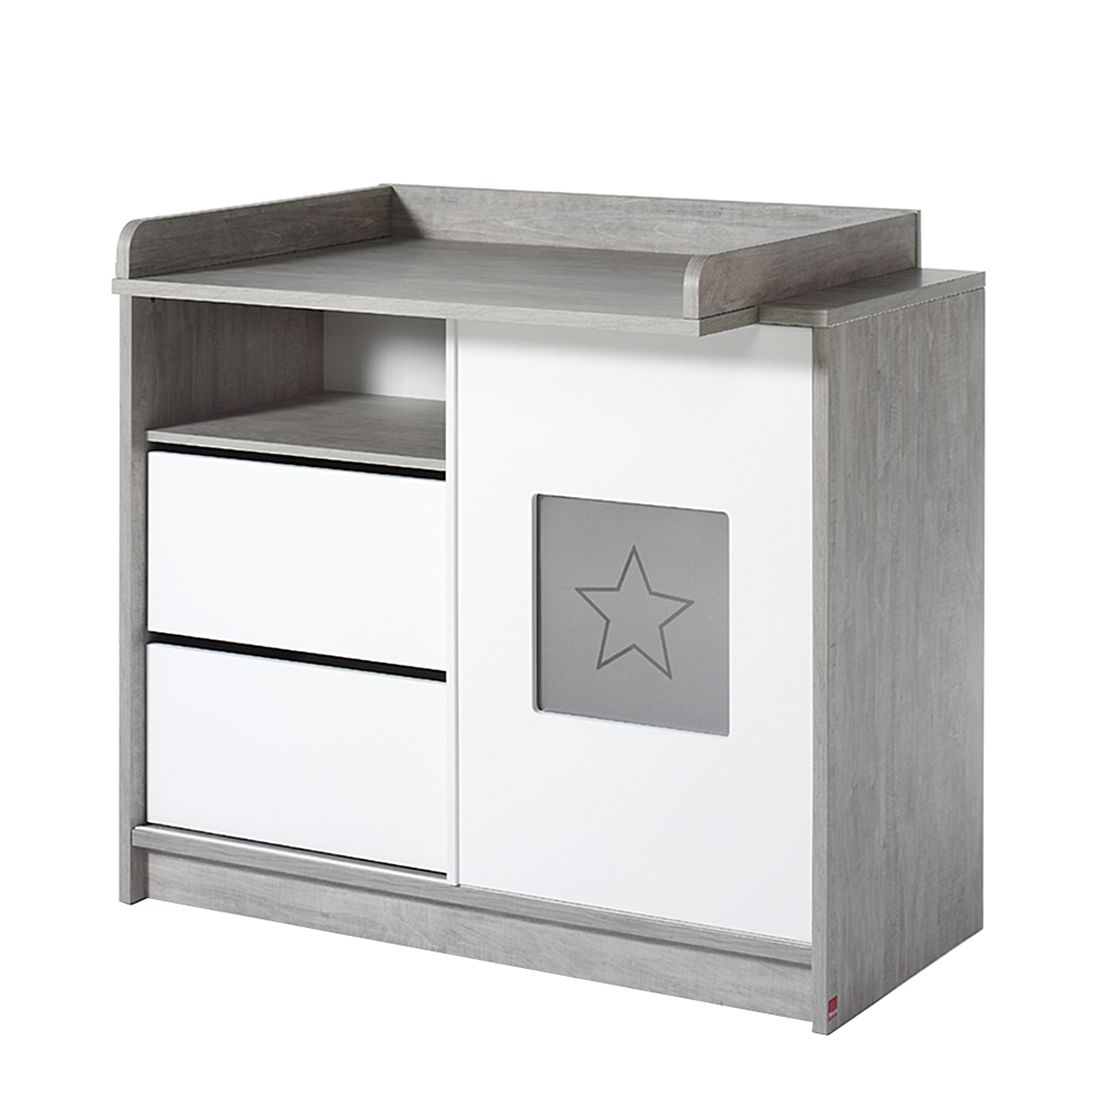 Wickelkommode ECO STAR - Driftwood/Weiß (Wickelkommode ECO - Melamin Dekor - Dekor Driftwood/Weiß - MDF weiß lackiert)